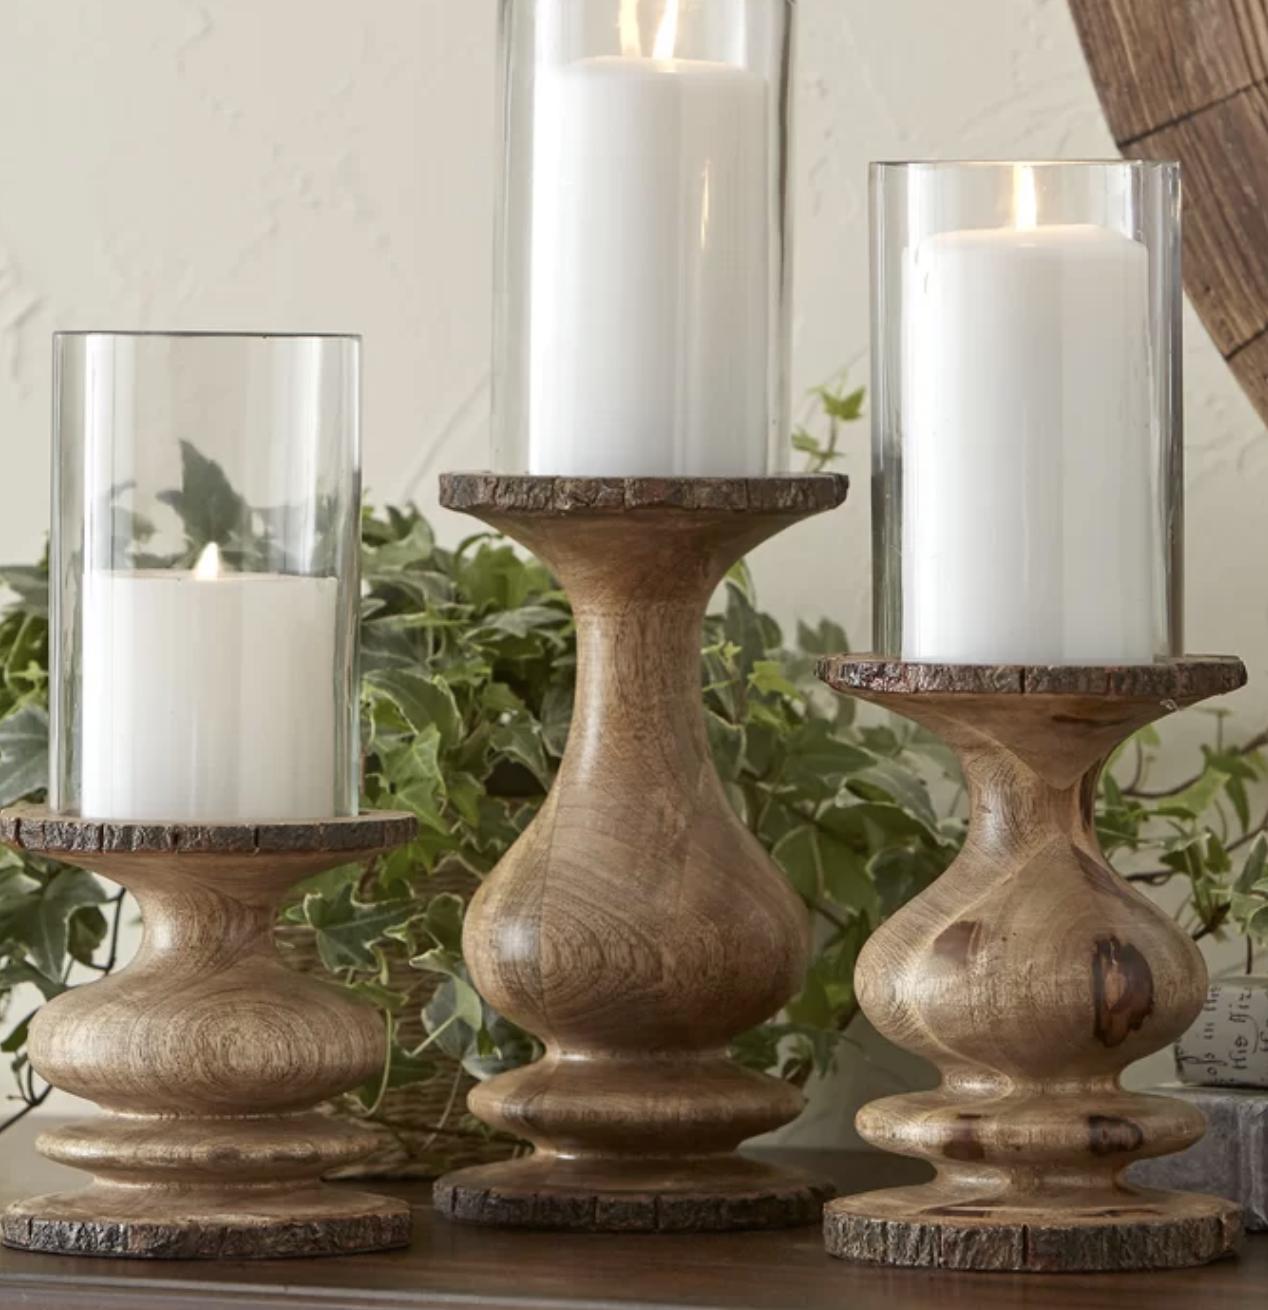 3 Piece Glass And Wood Hurricane Set Wood Candle Holders Wood Candles Candle Holders